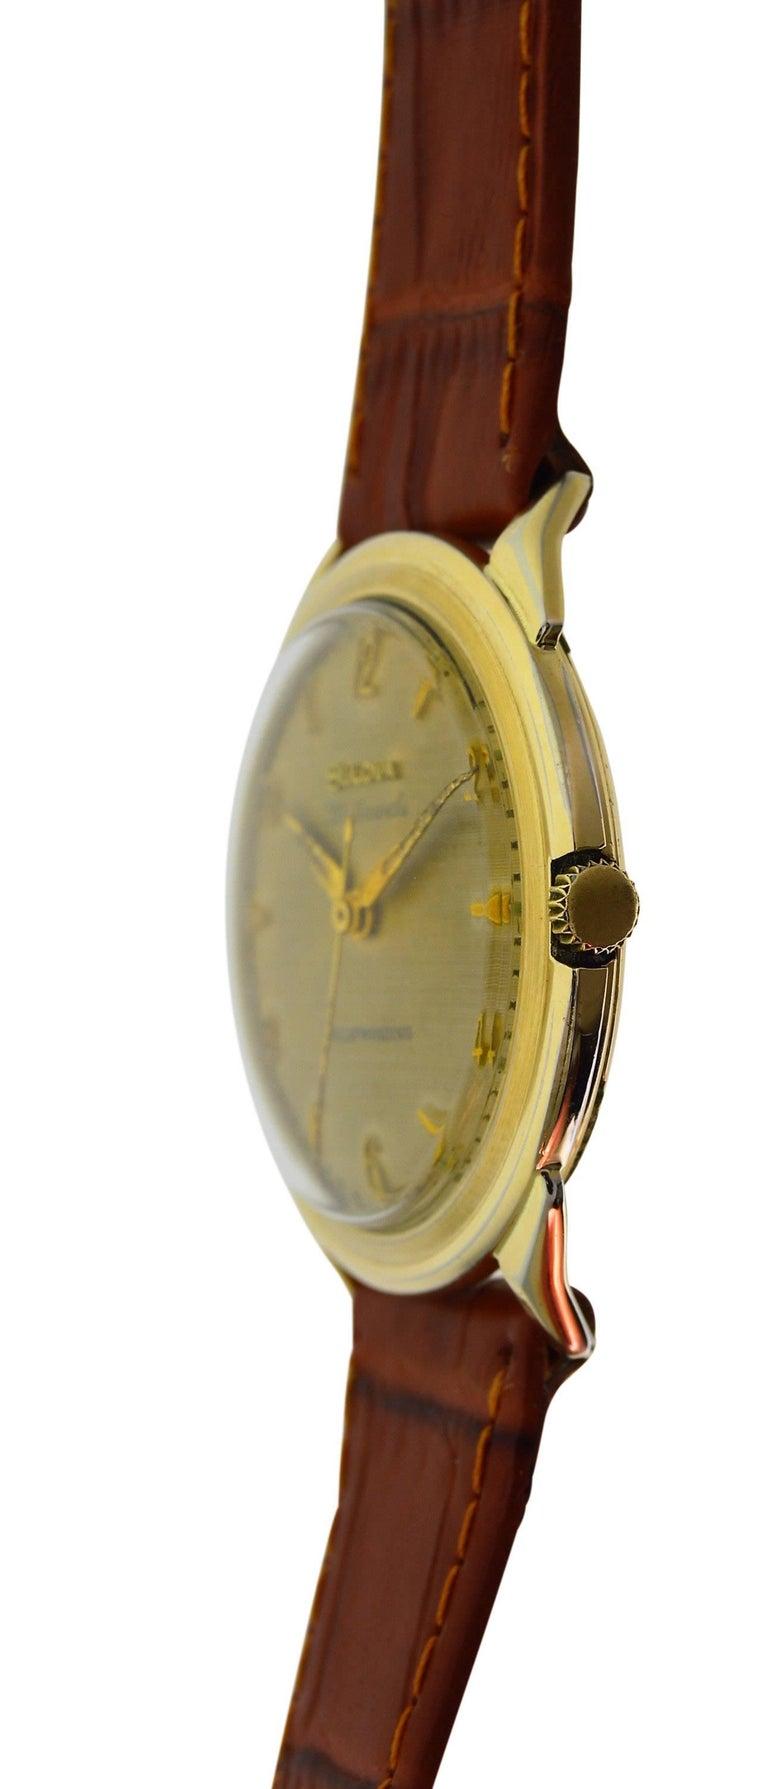 Bulova Yellow Gold Filled Art Deco Original Dial Self winding Wristwatch, 1960s For Sale 2